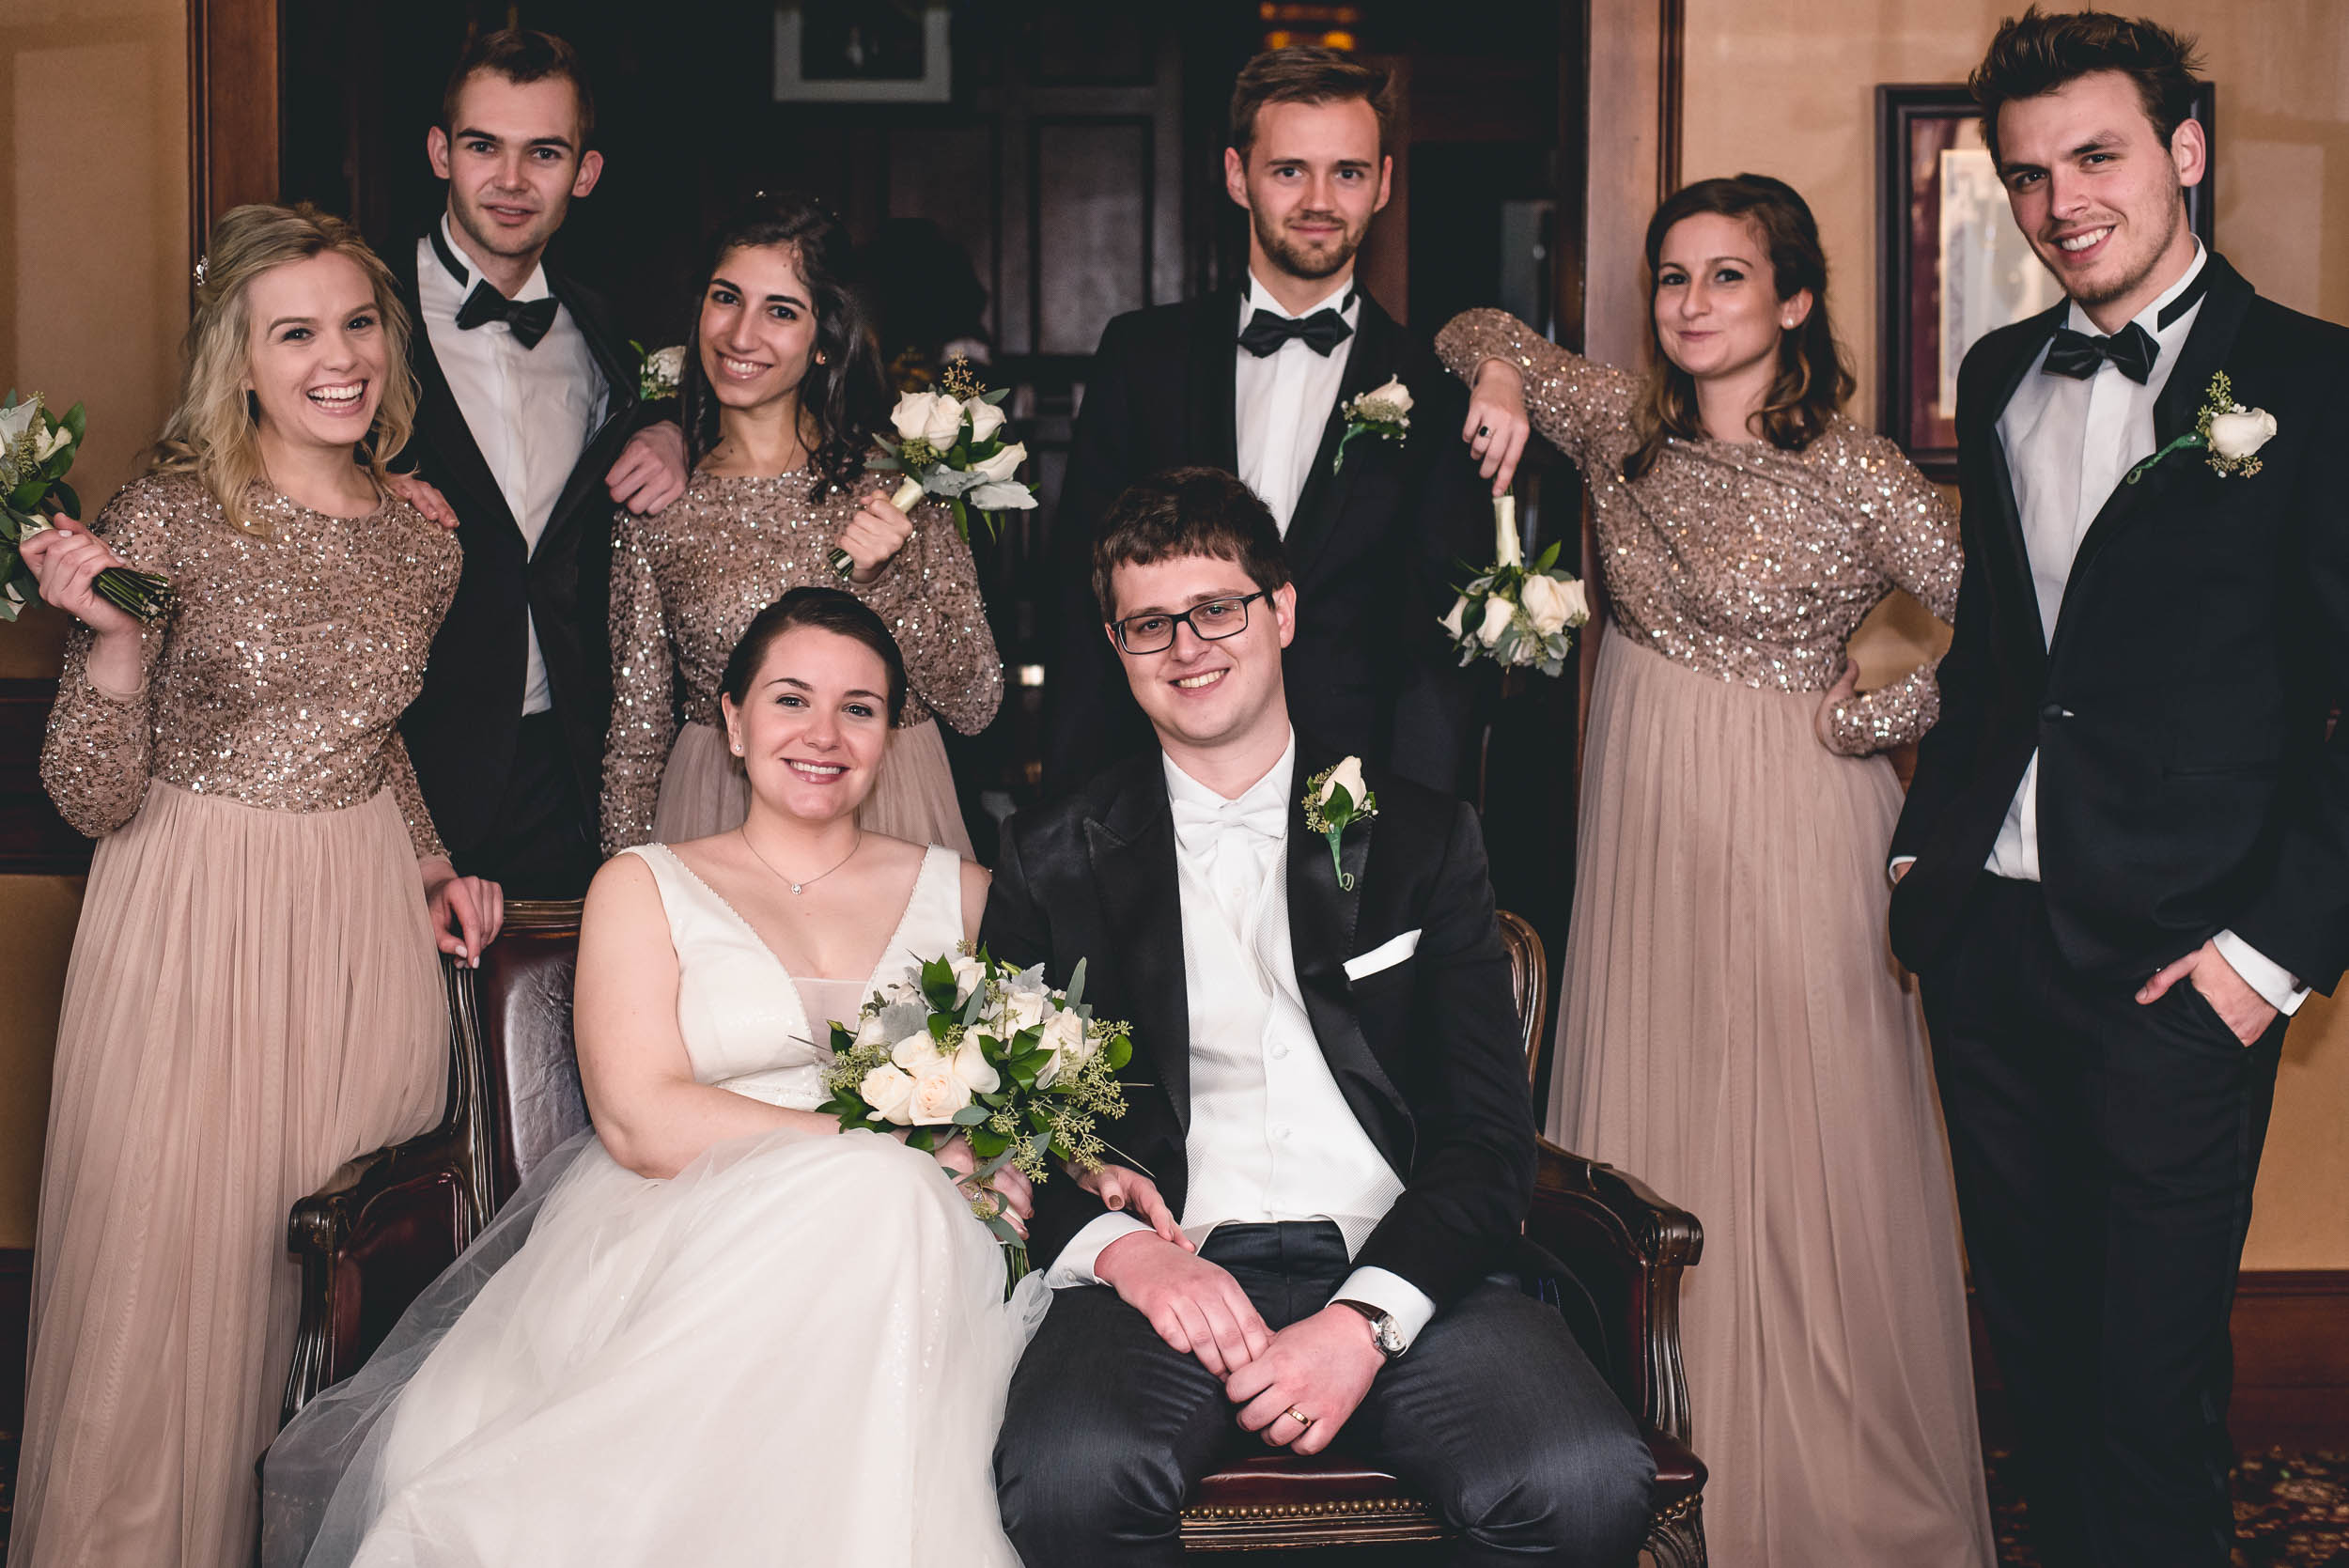 KatieandMathias_Morristown_NewJersey_Wedding_Church_Assumption_Madison_Hotel(21of65).jpg